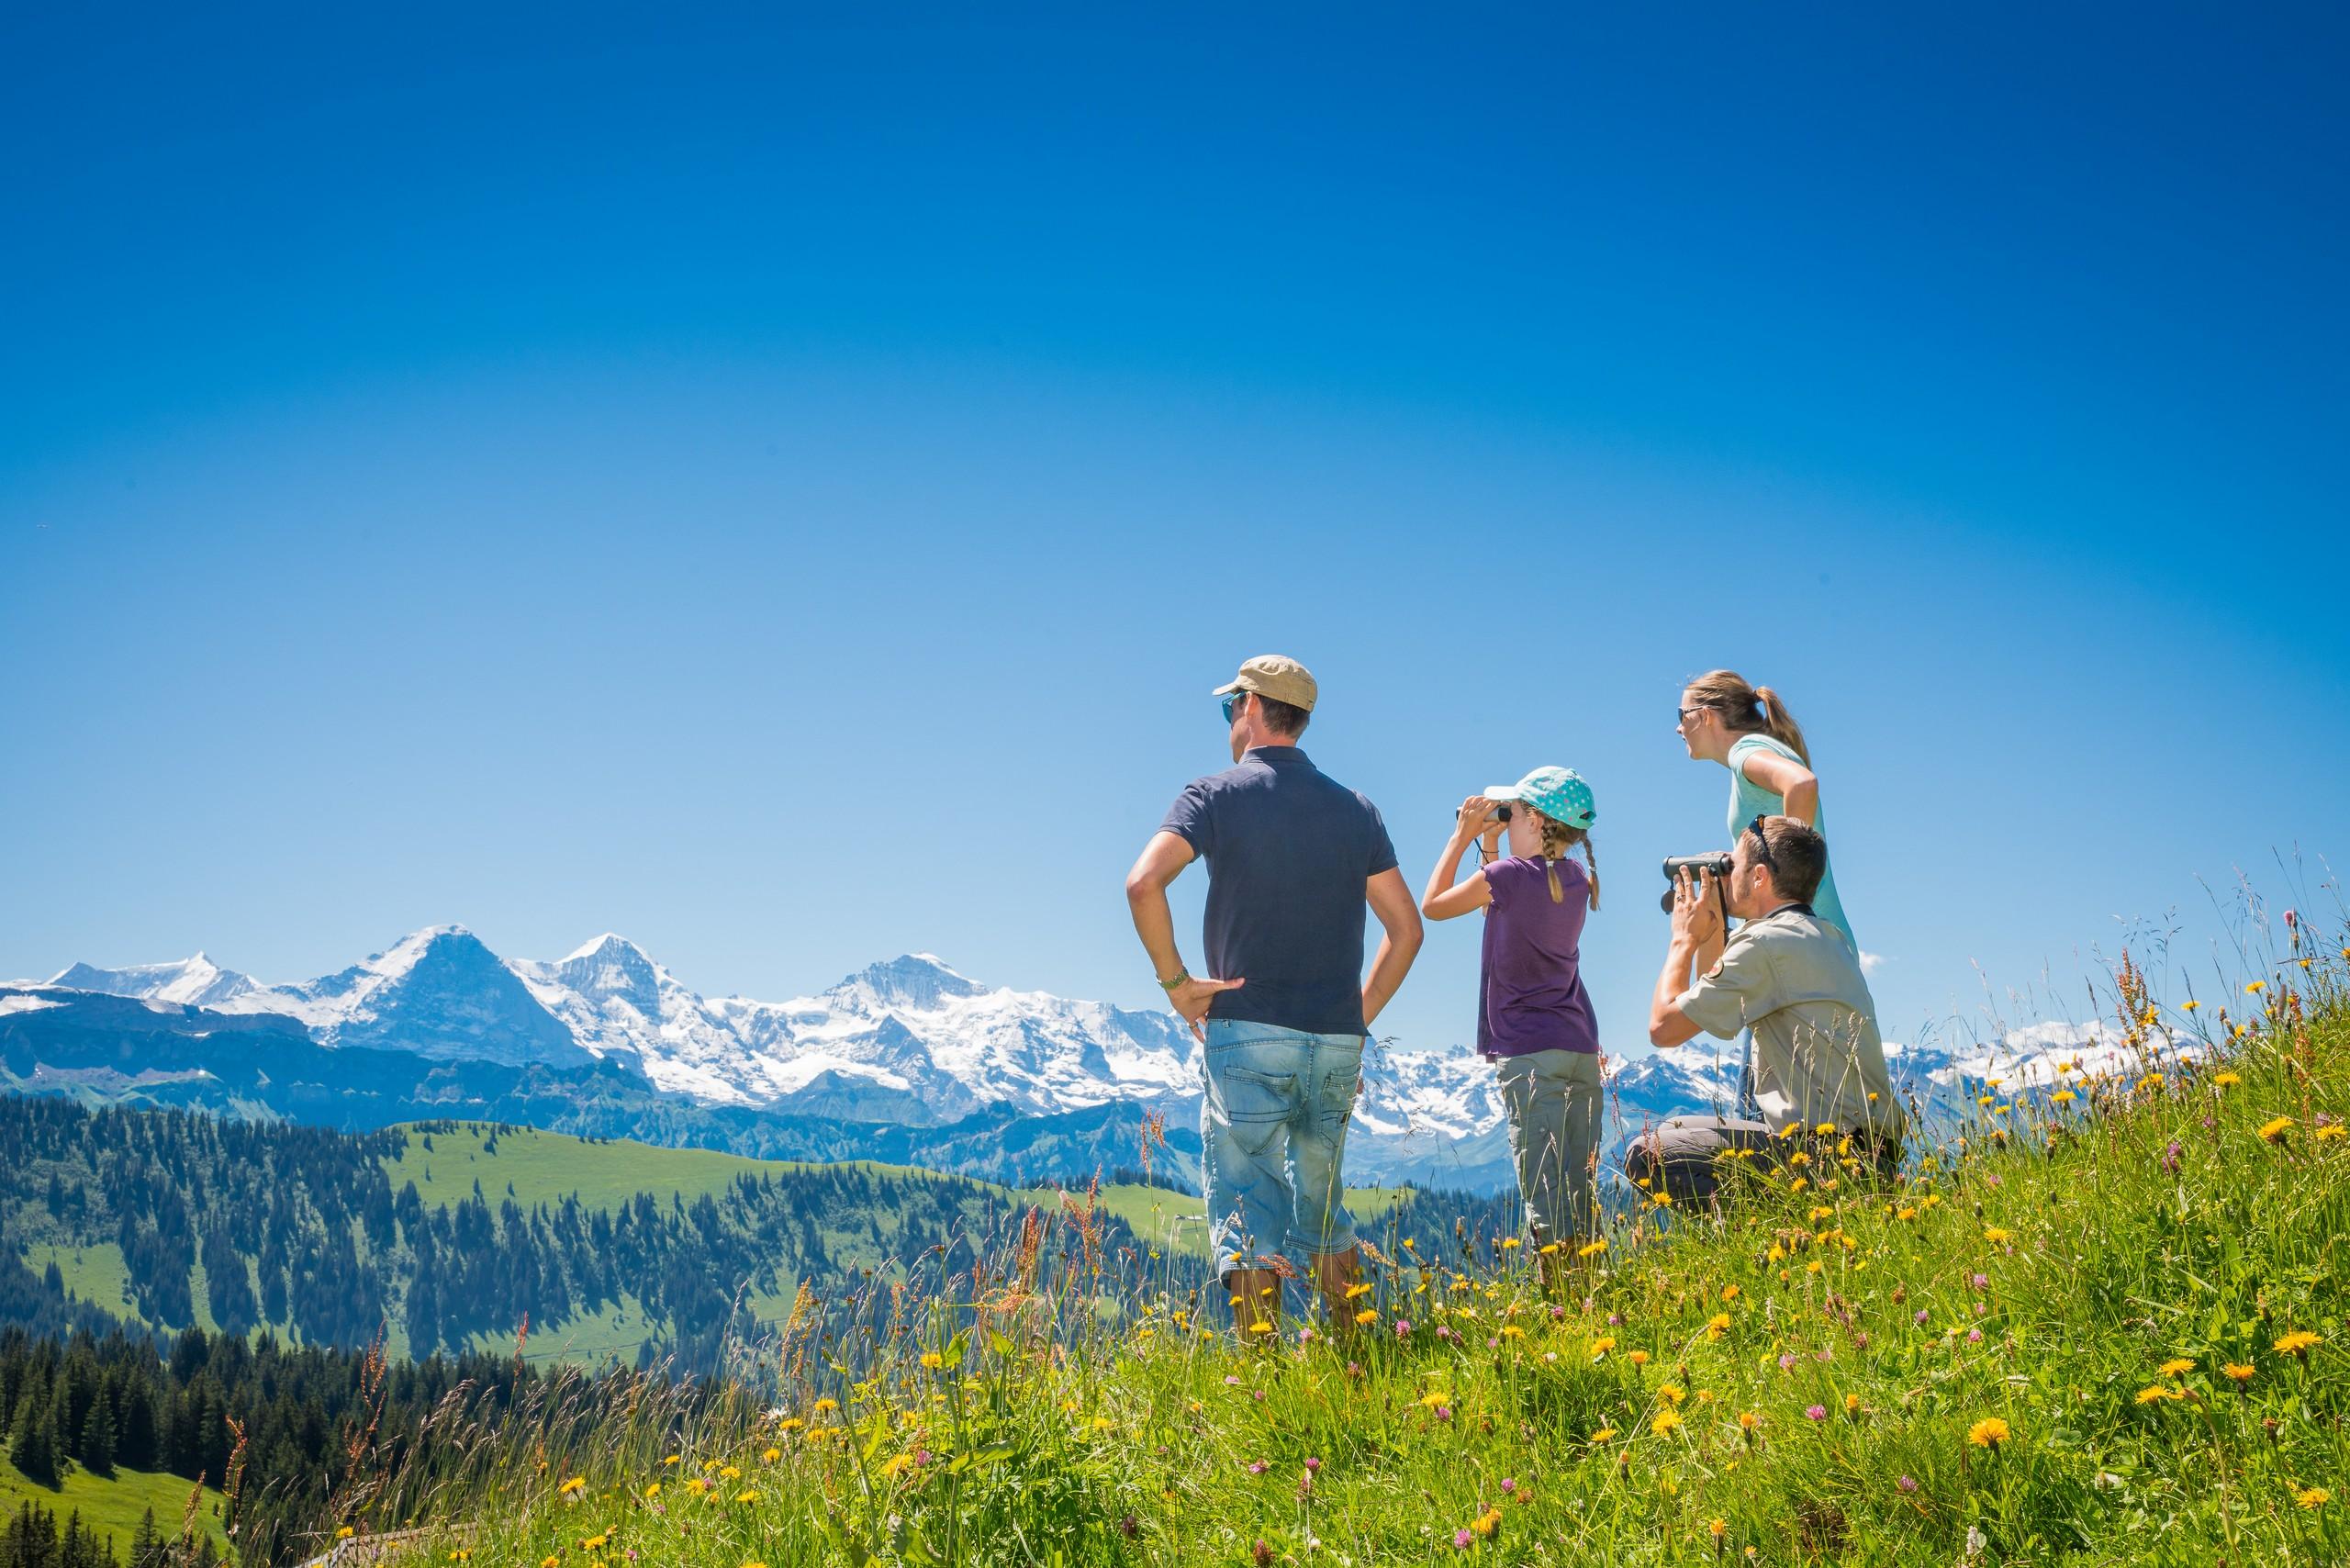 habkern-lombachalp-familie-wandern-sommer-feldstecher-panorama-familienaktivitaeten-themen-erlebniswege